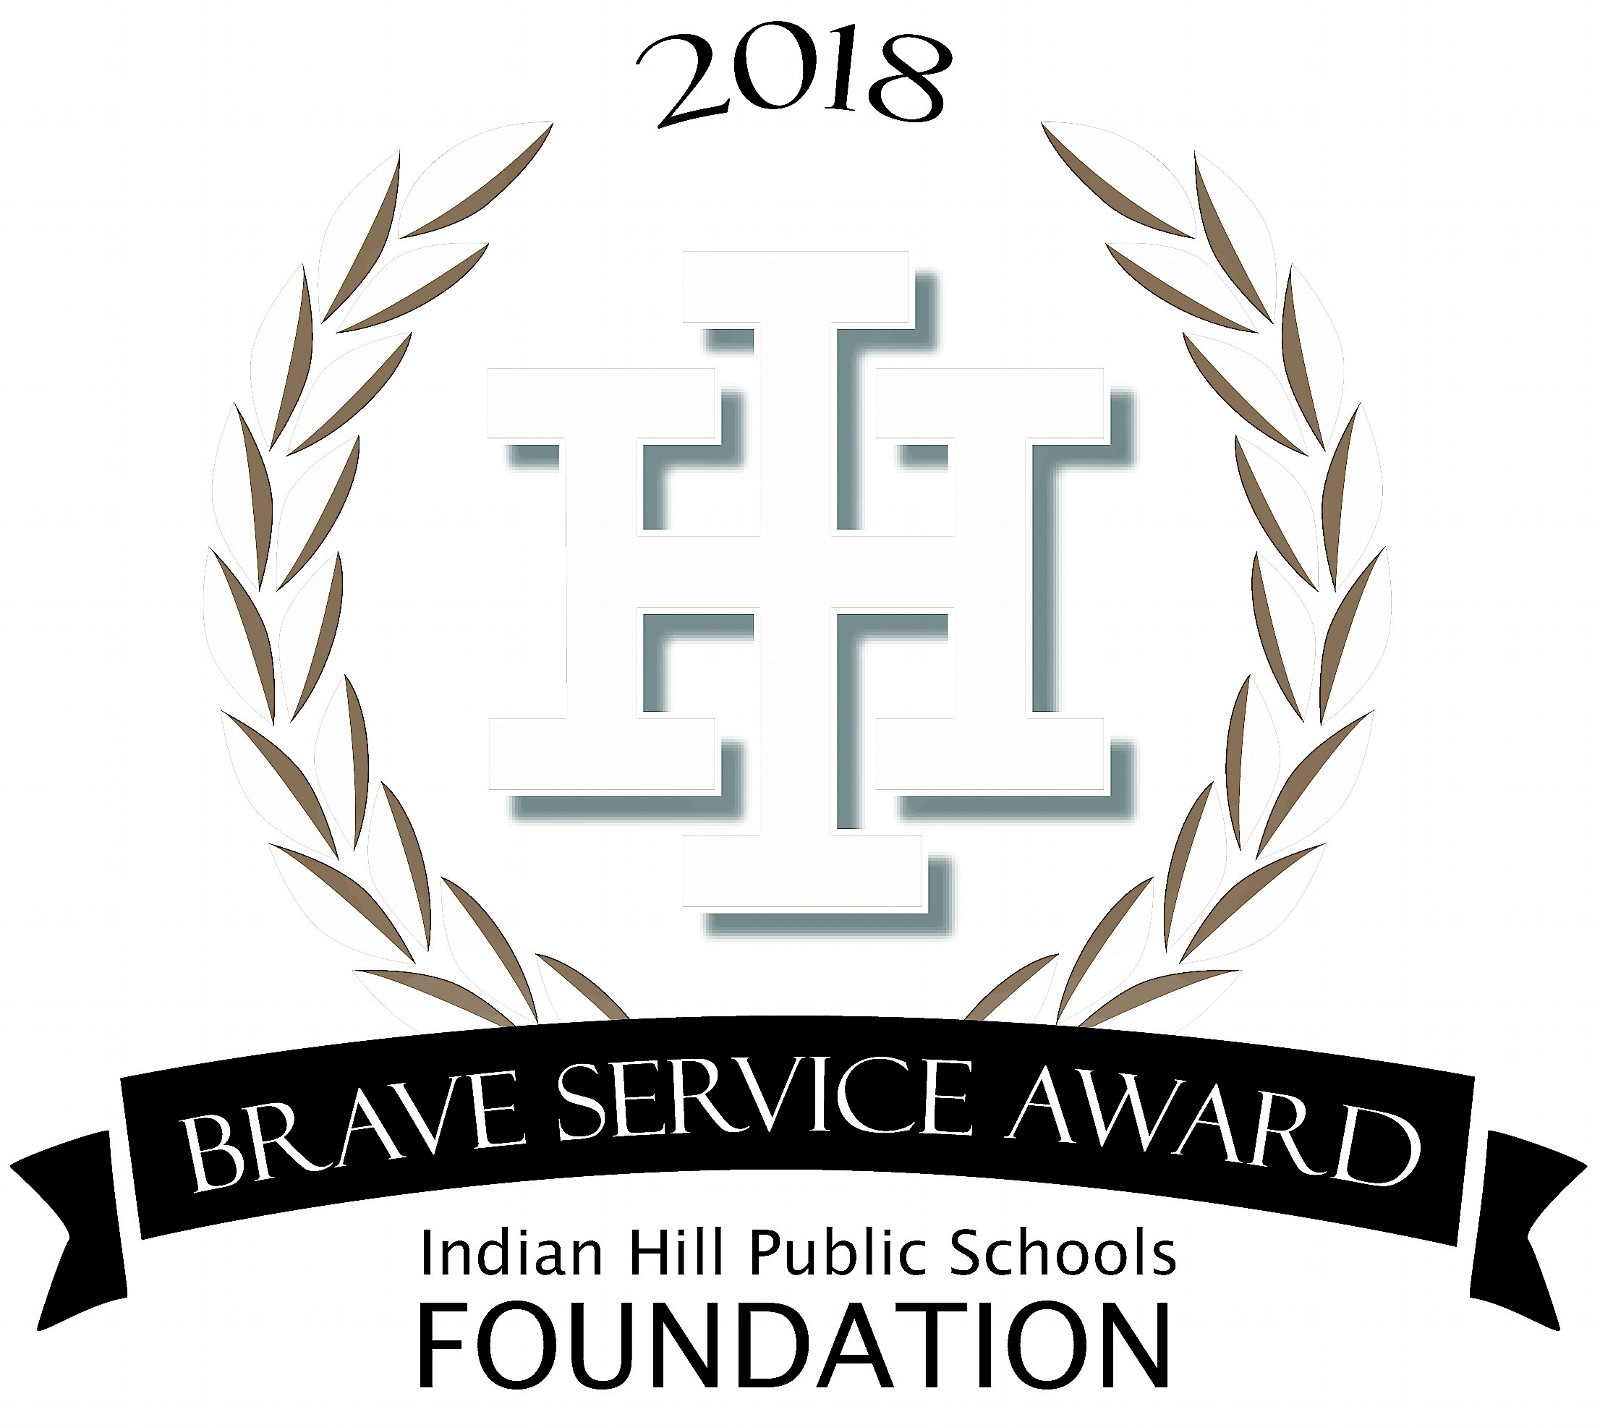 Brave Service Award